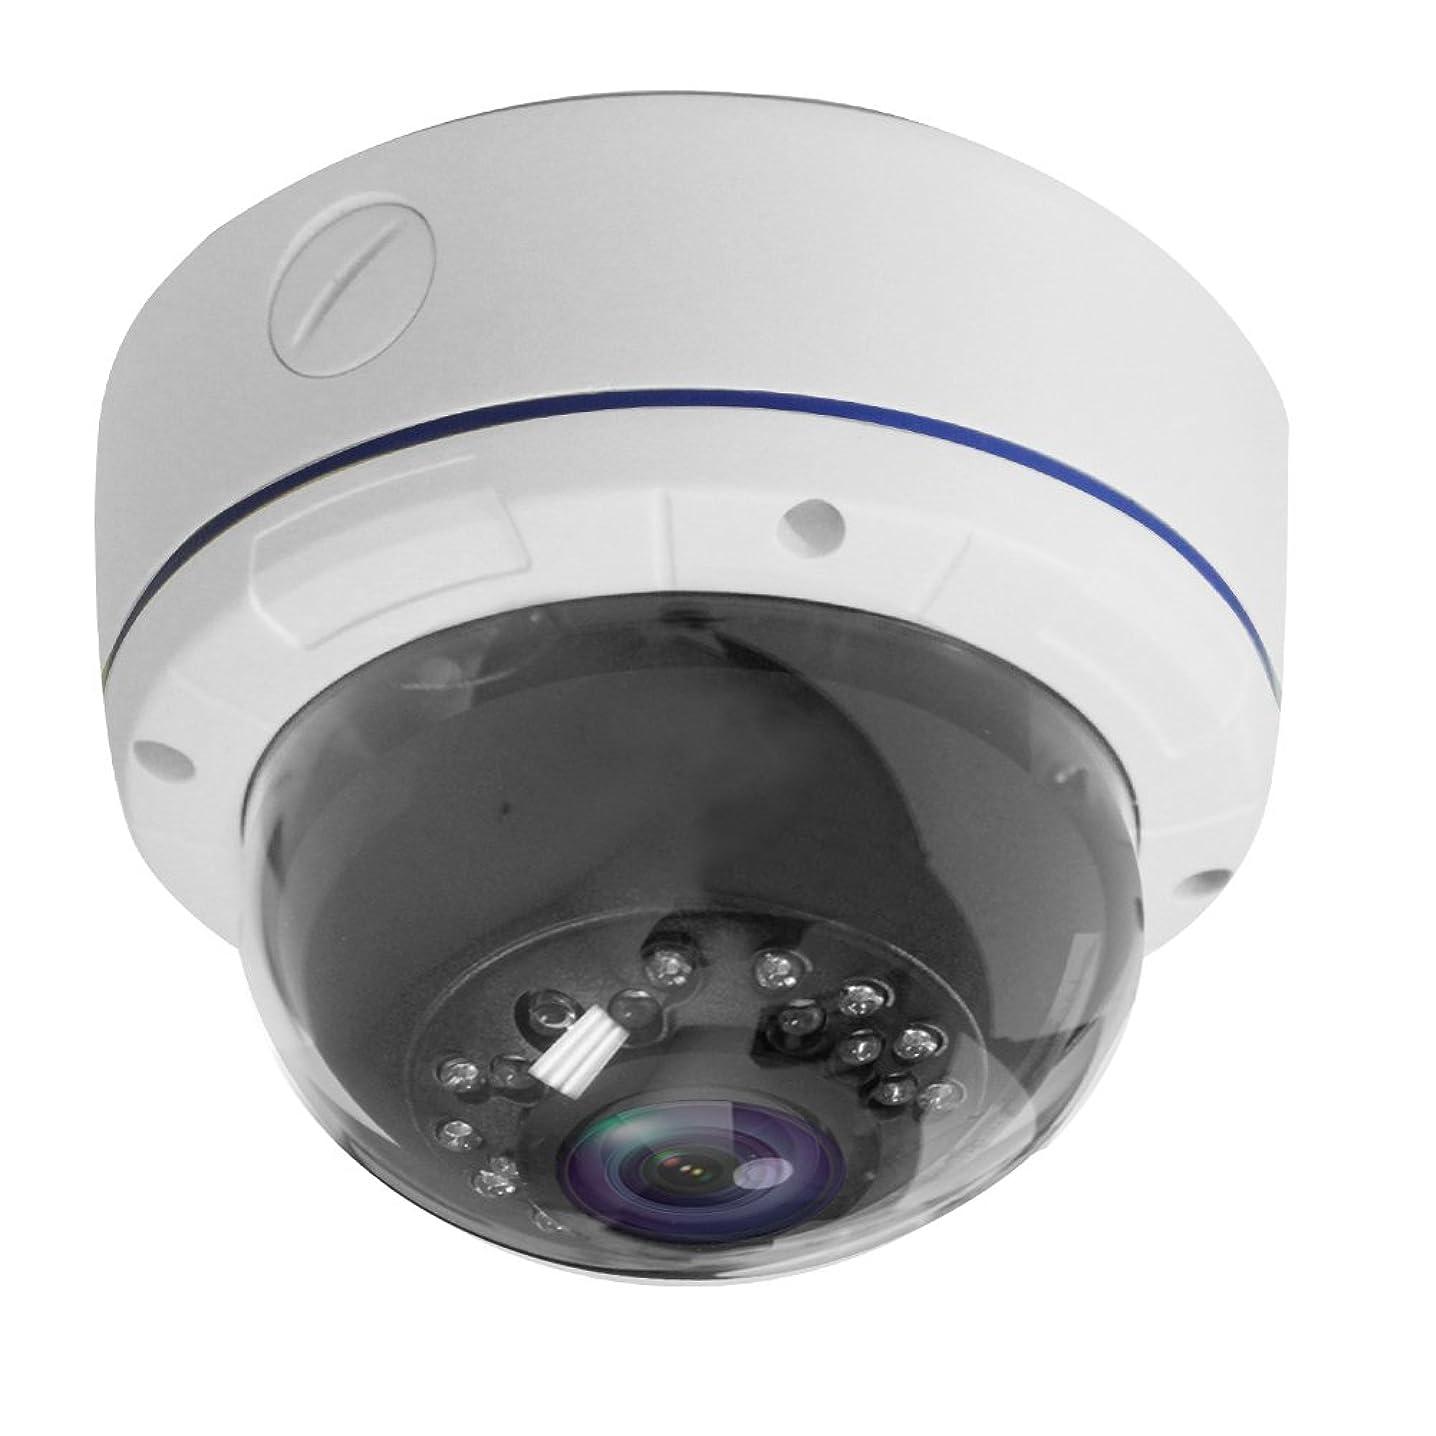 Gawker 2.8-12mm Varifocal 2.2MP Sensor Lens Dome CCTV Security Camera,1080P 4in1 HD-TVI default/AHD/CVI/CVBS video out,IP66 Vandalproof Outdoor/Indoor Surveillance,100ft Smart IR,DC12V/AC24V,G830QHDW2